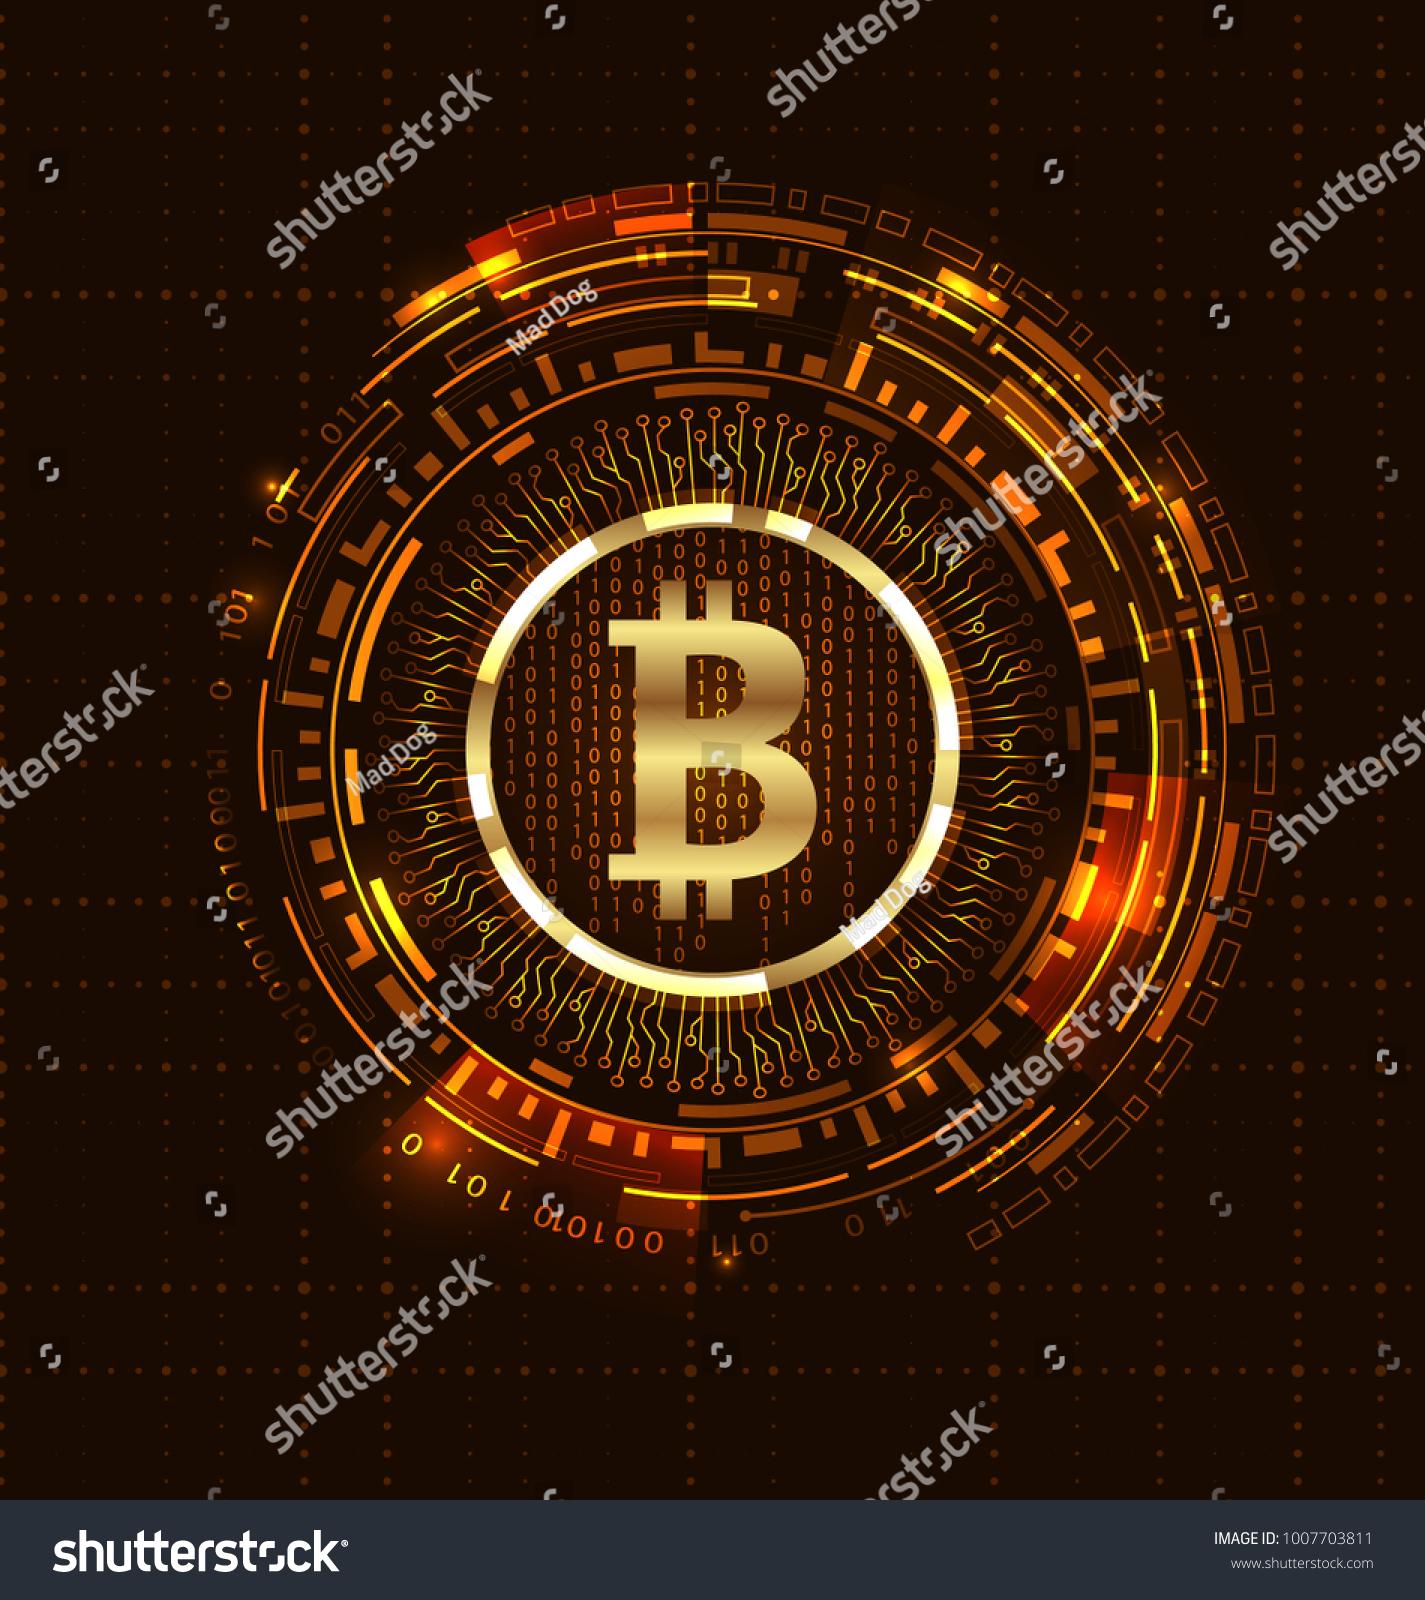 Golden Bitcoin Digital Currency Futuristic Money Stock Illustration